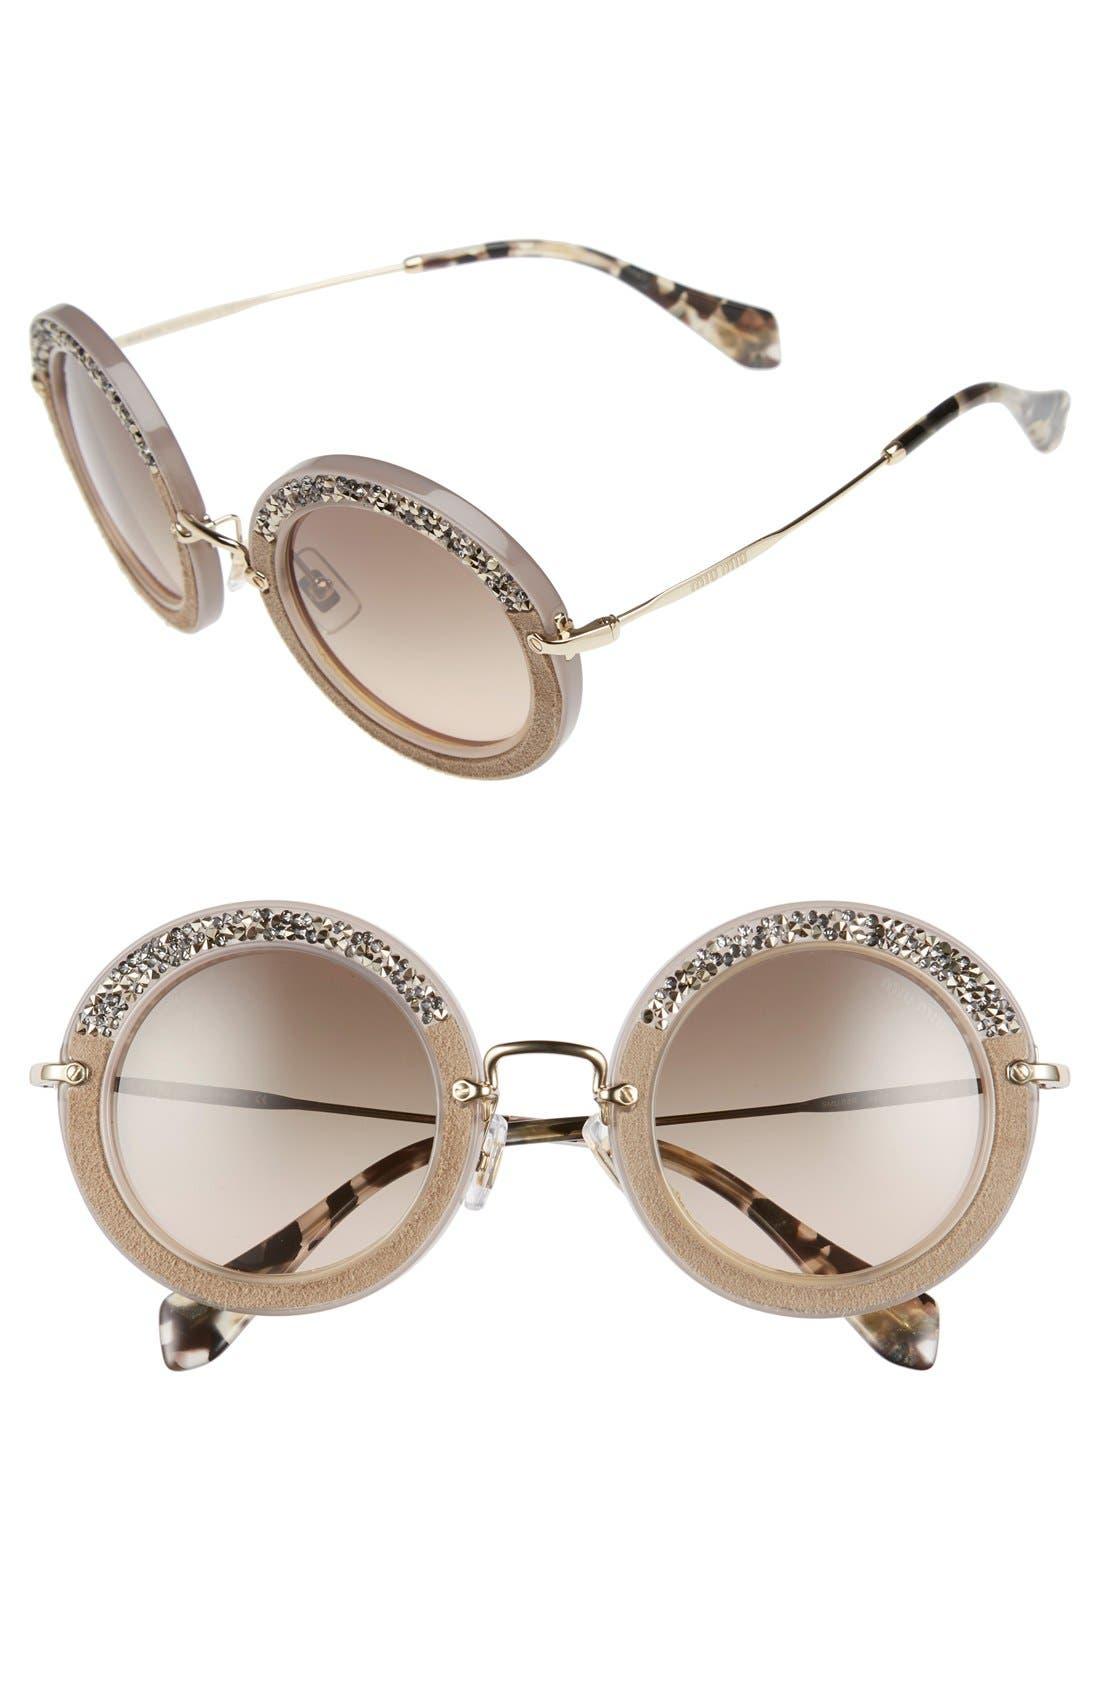 Main Image - Miu Miu 49mm Round Sunglasses